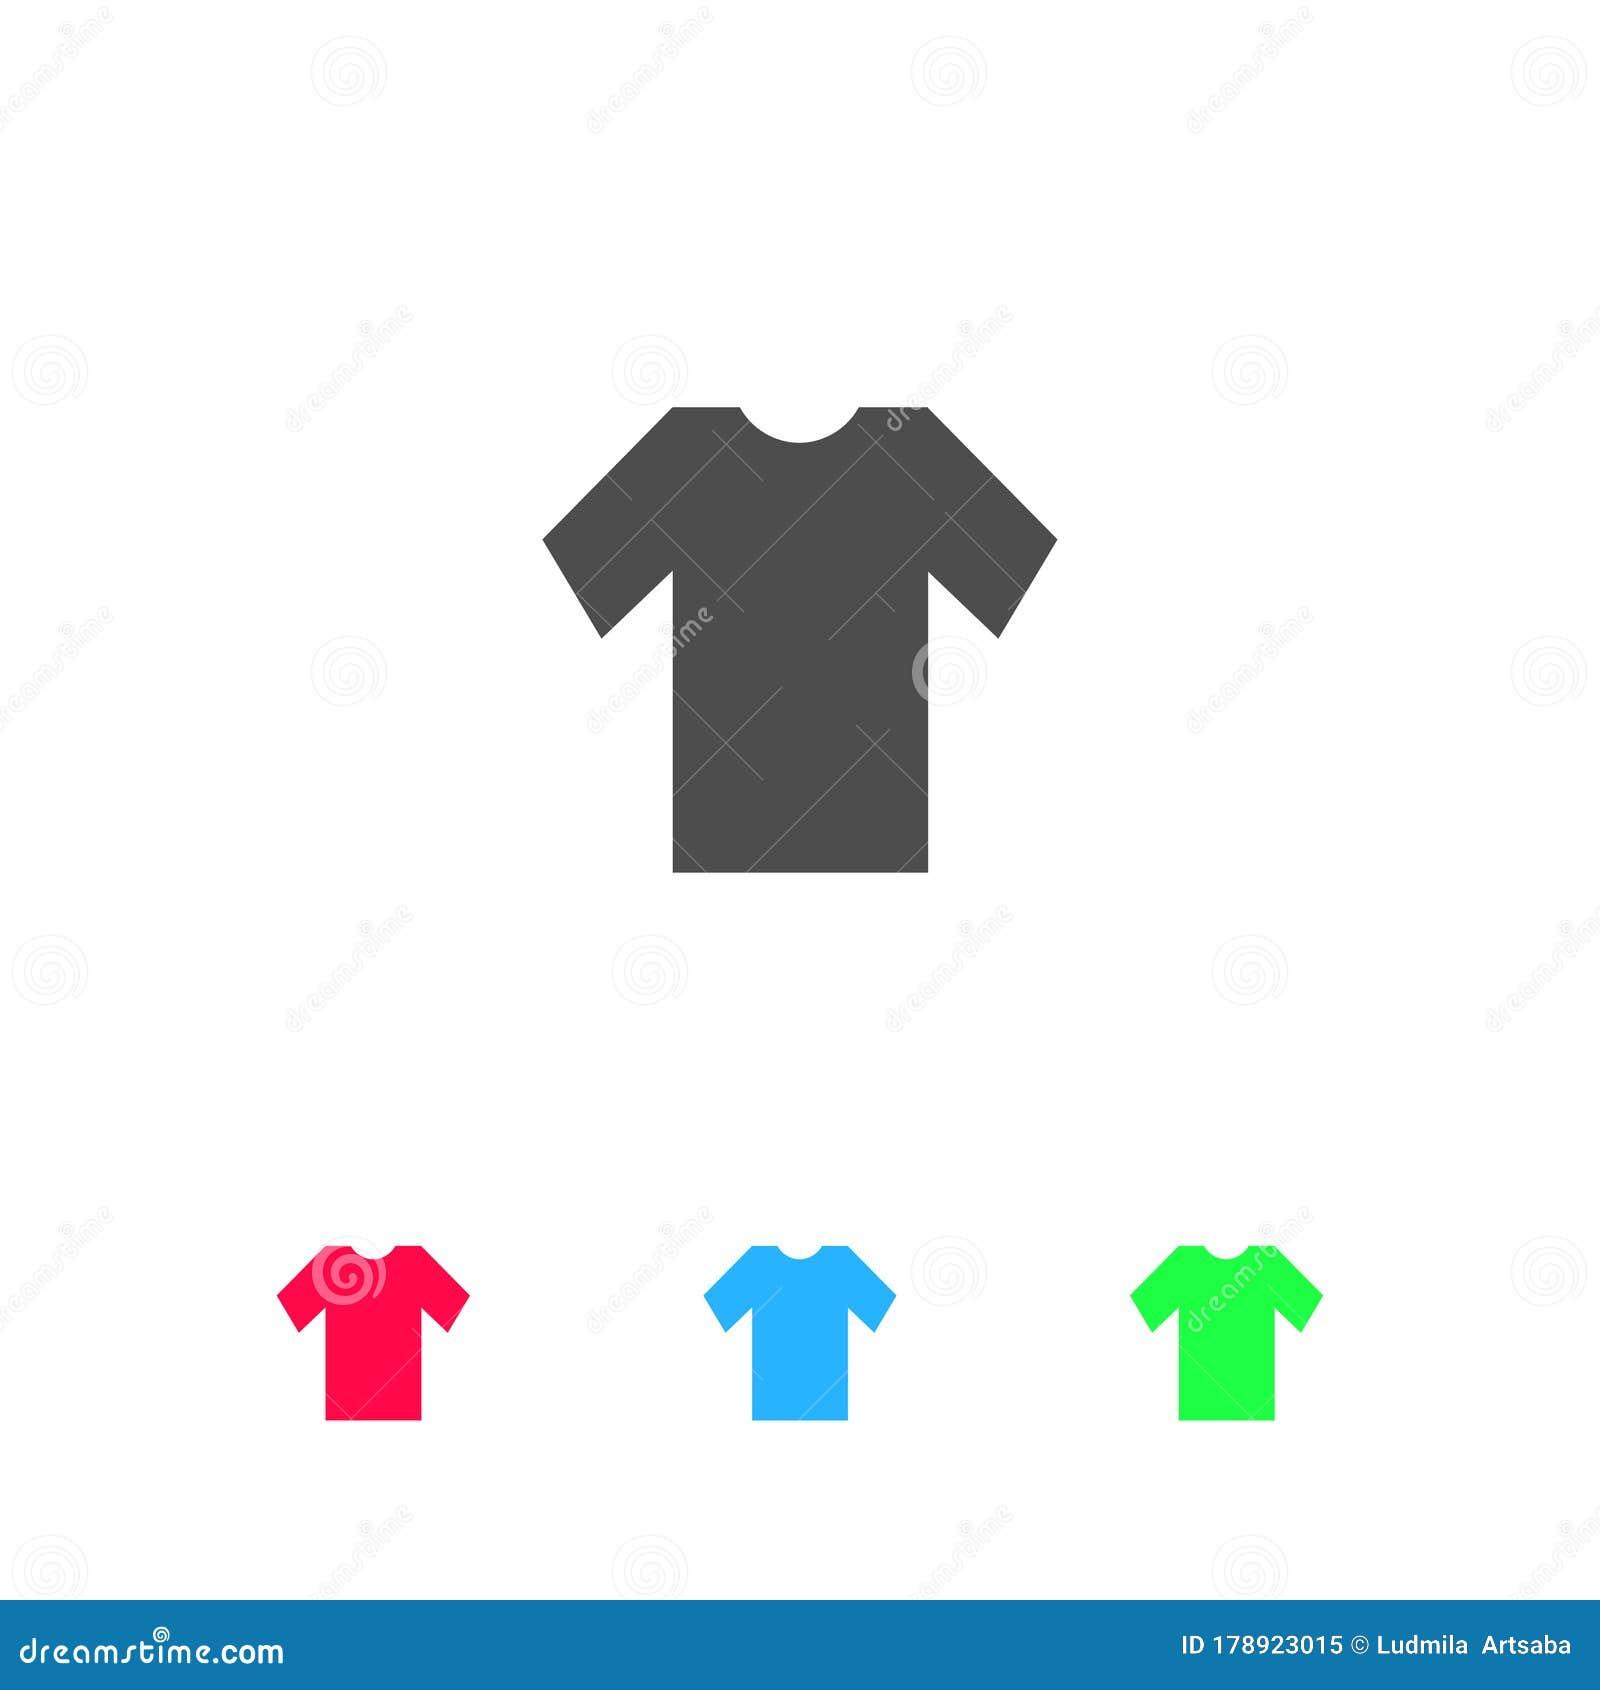 tshirt icon flat stock illustration illustration of fashionable 178923015 tshirt icon flat stock illustration illustration of fashionable 178923015